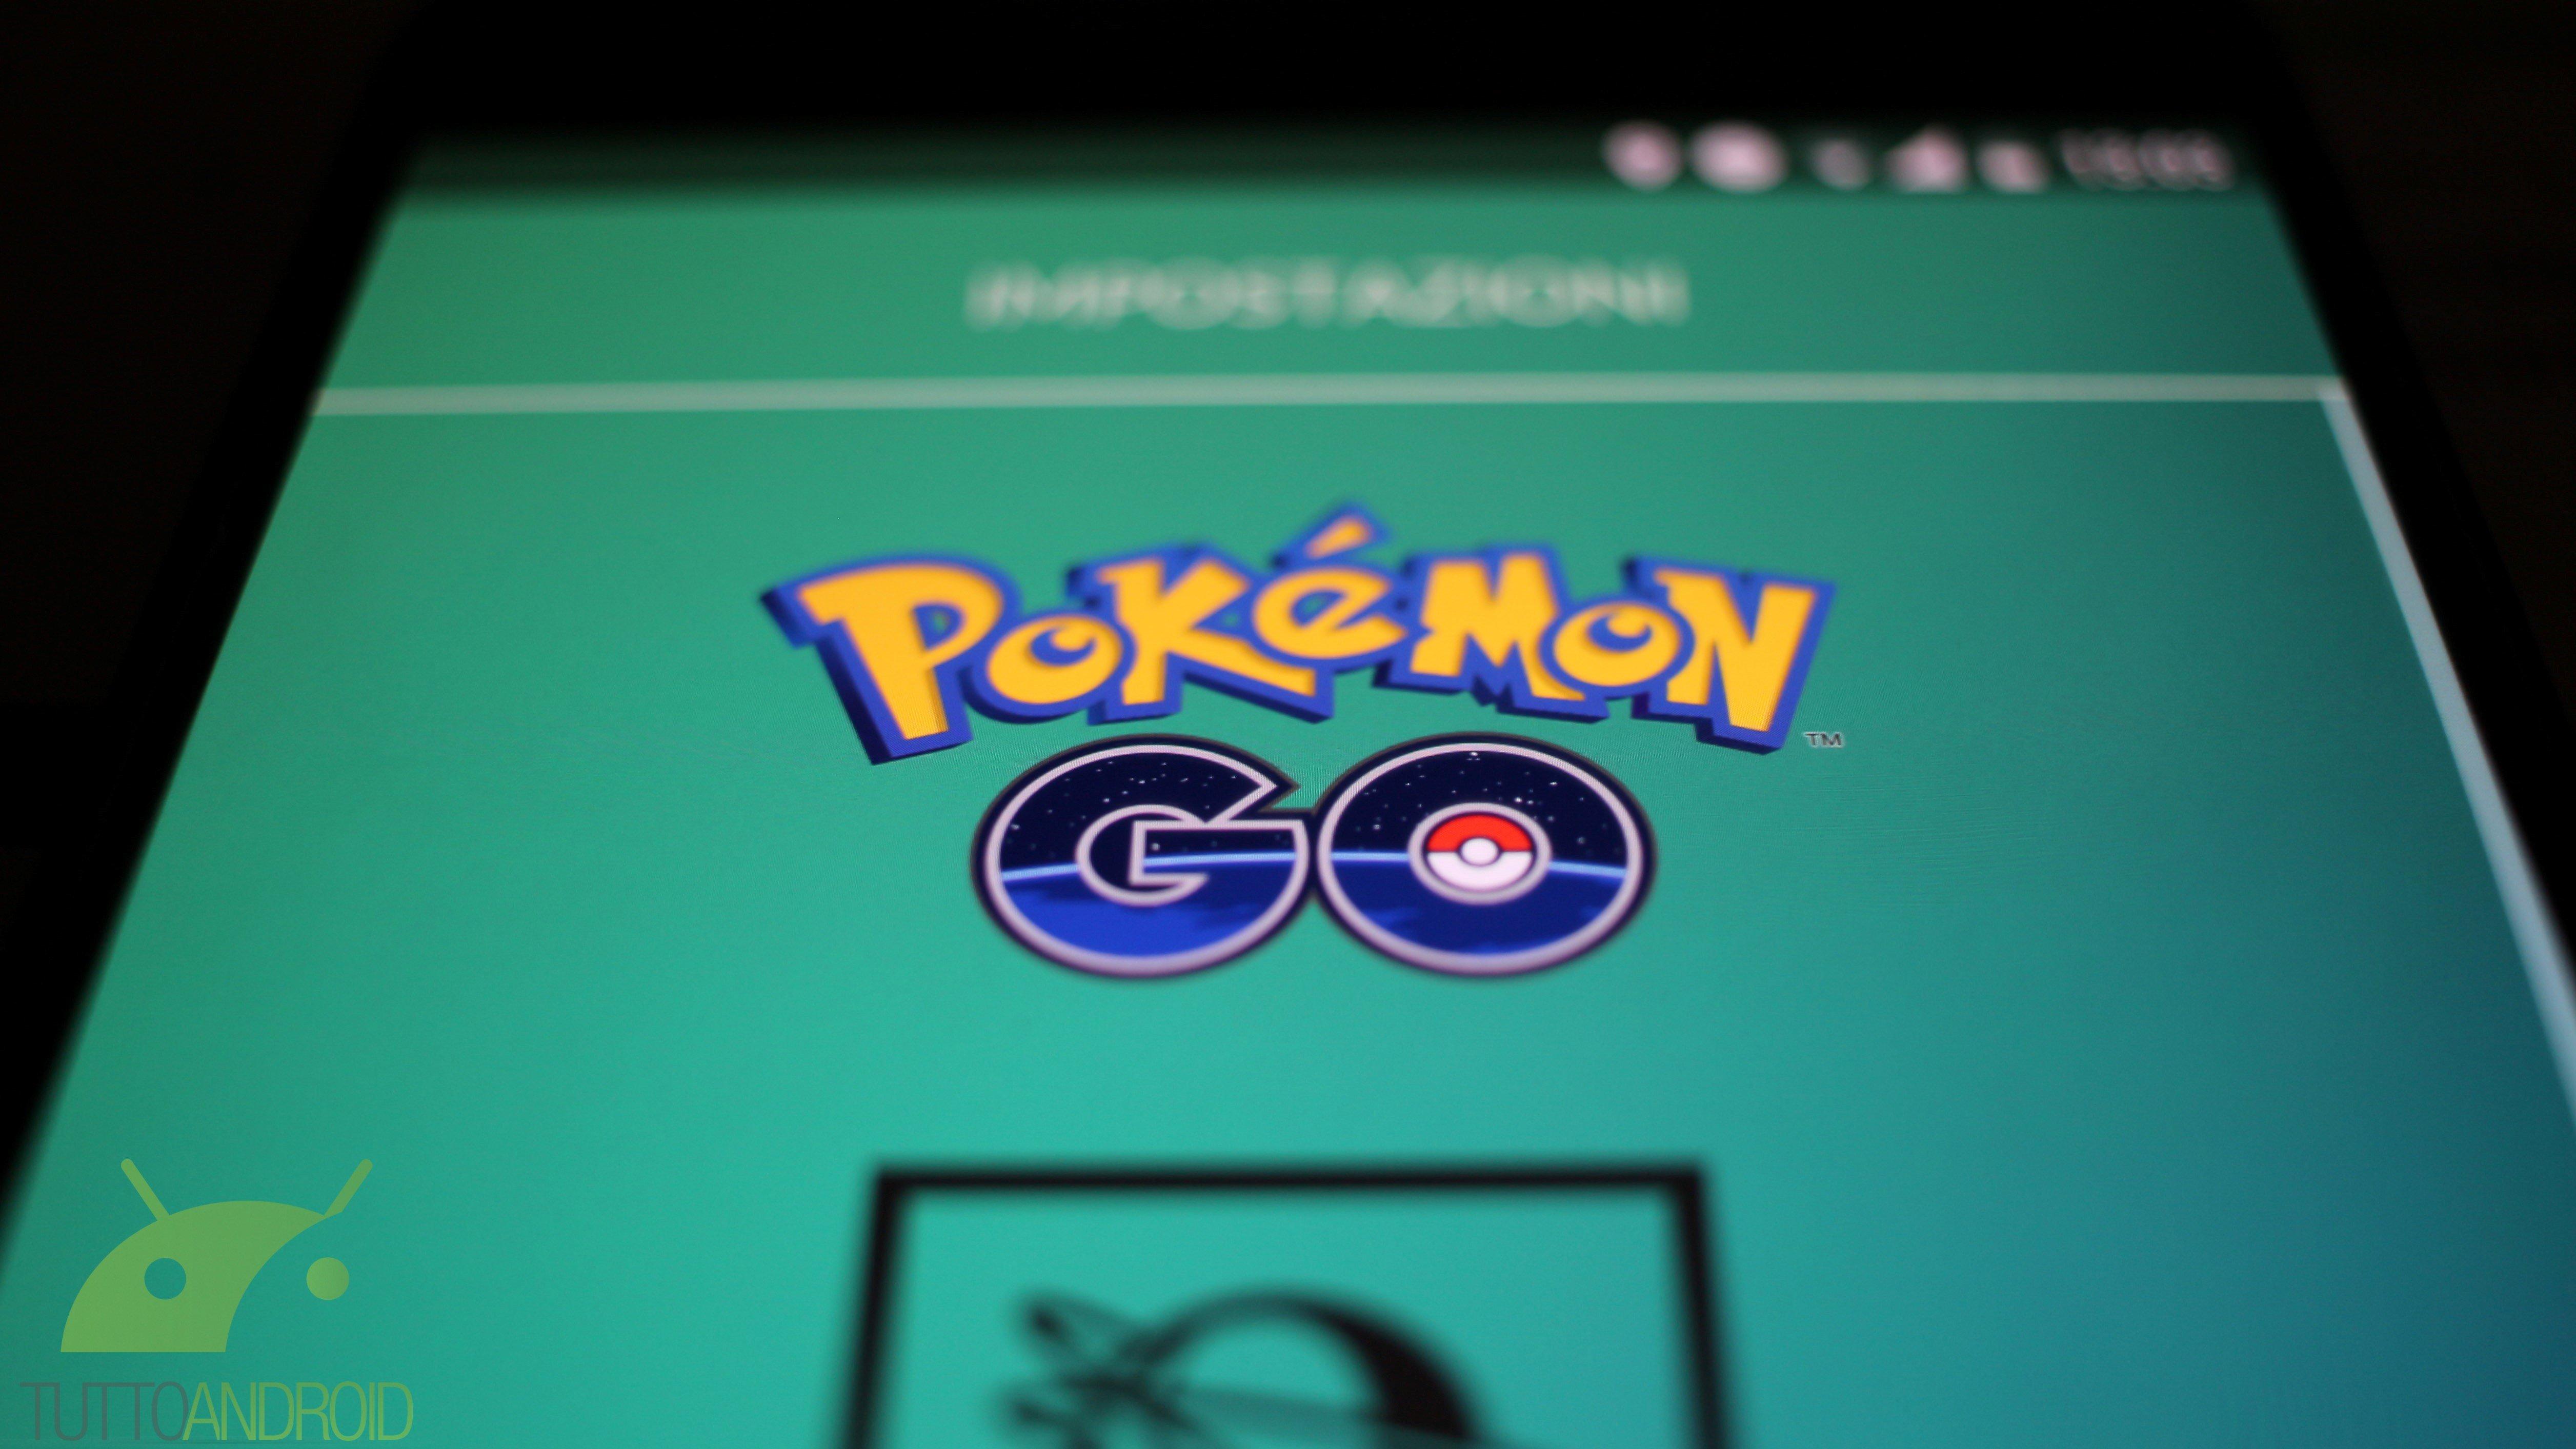 Pokémon GO: incassi per circa 950 milioni di dollari nel 2016